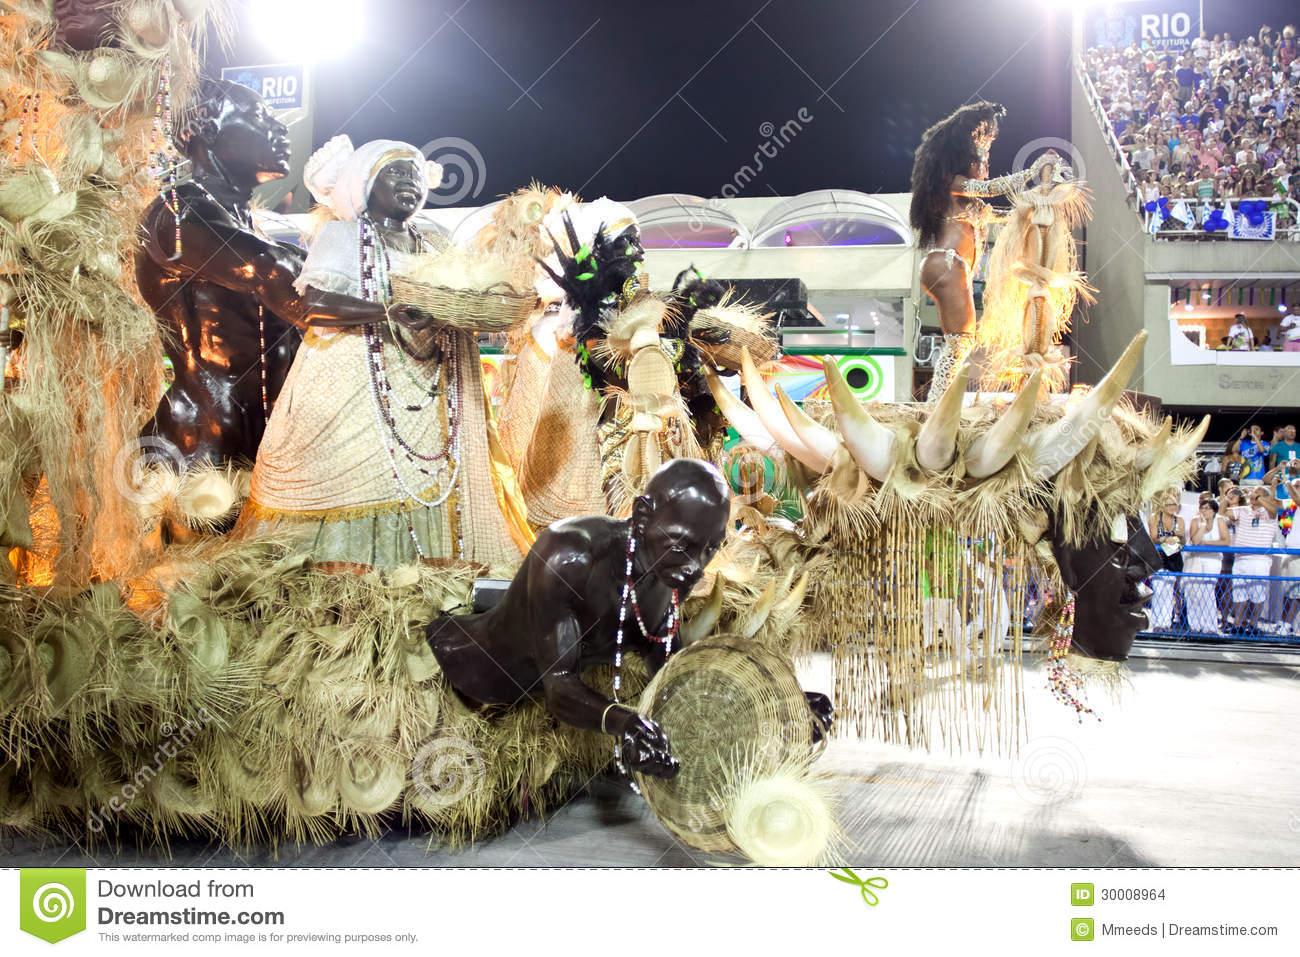 rio-de-janeiro-february-performance-people-carnival-rio-de-janeiro-sambodromo-february-brazil-rio-carnival-biggest-carnival-world-30008964